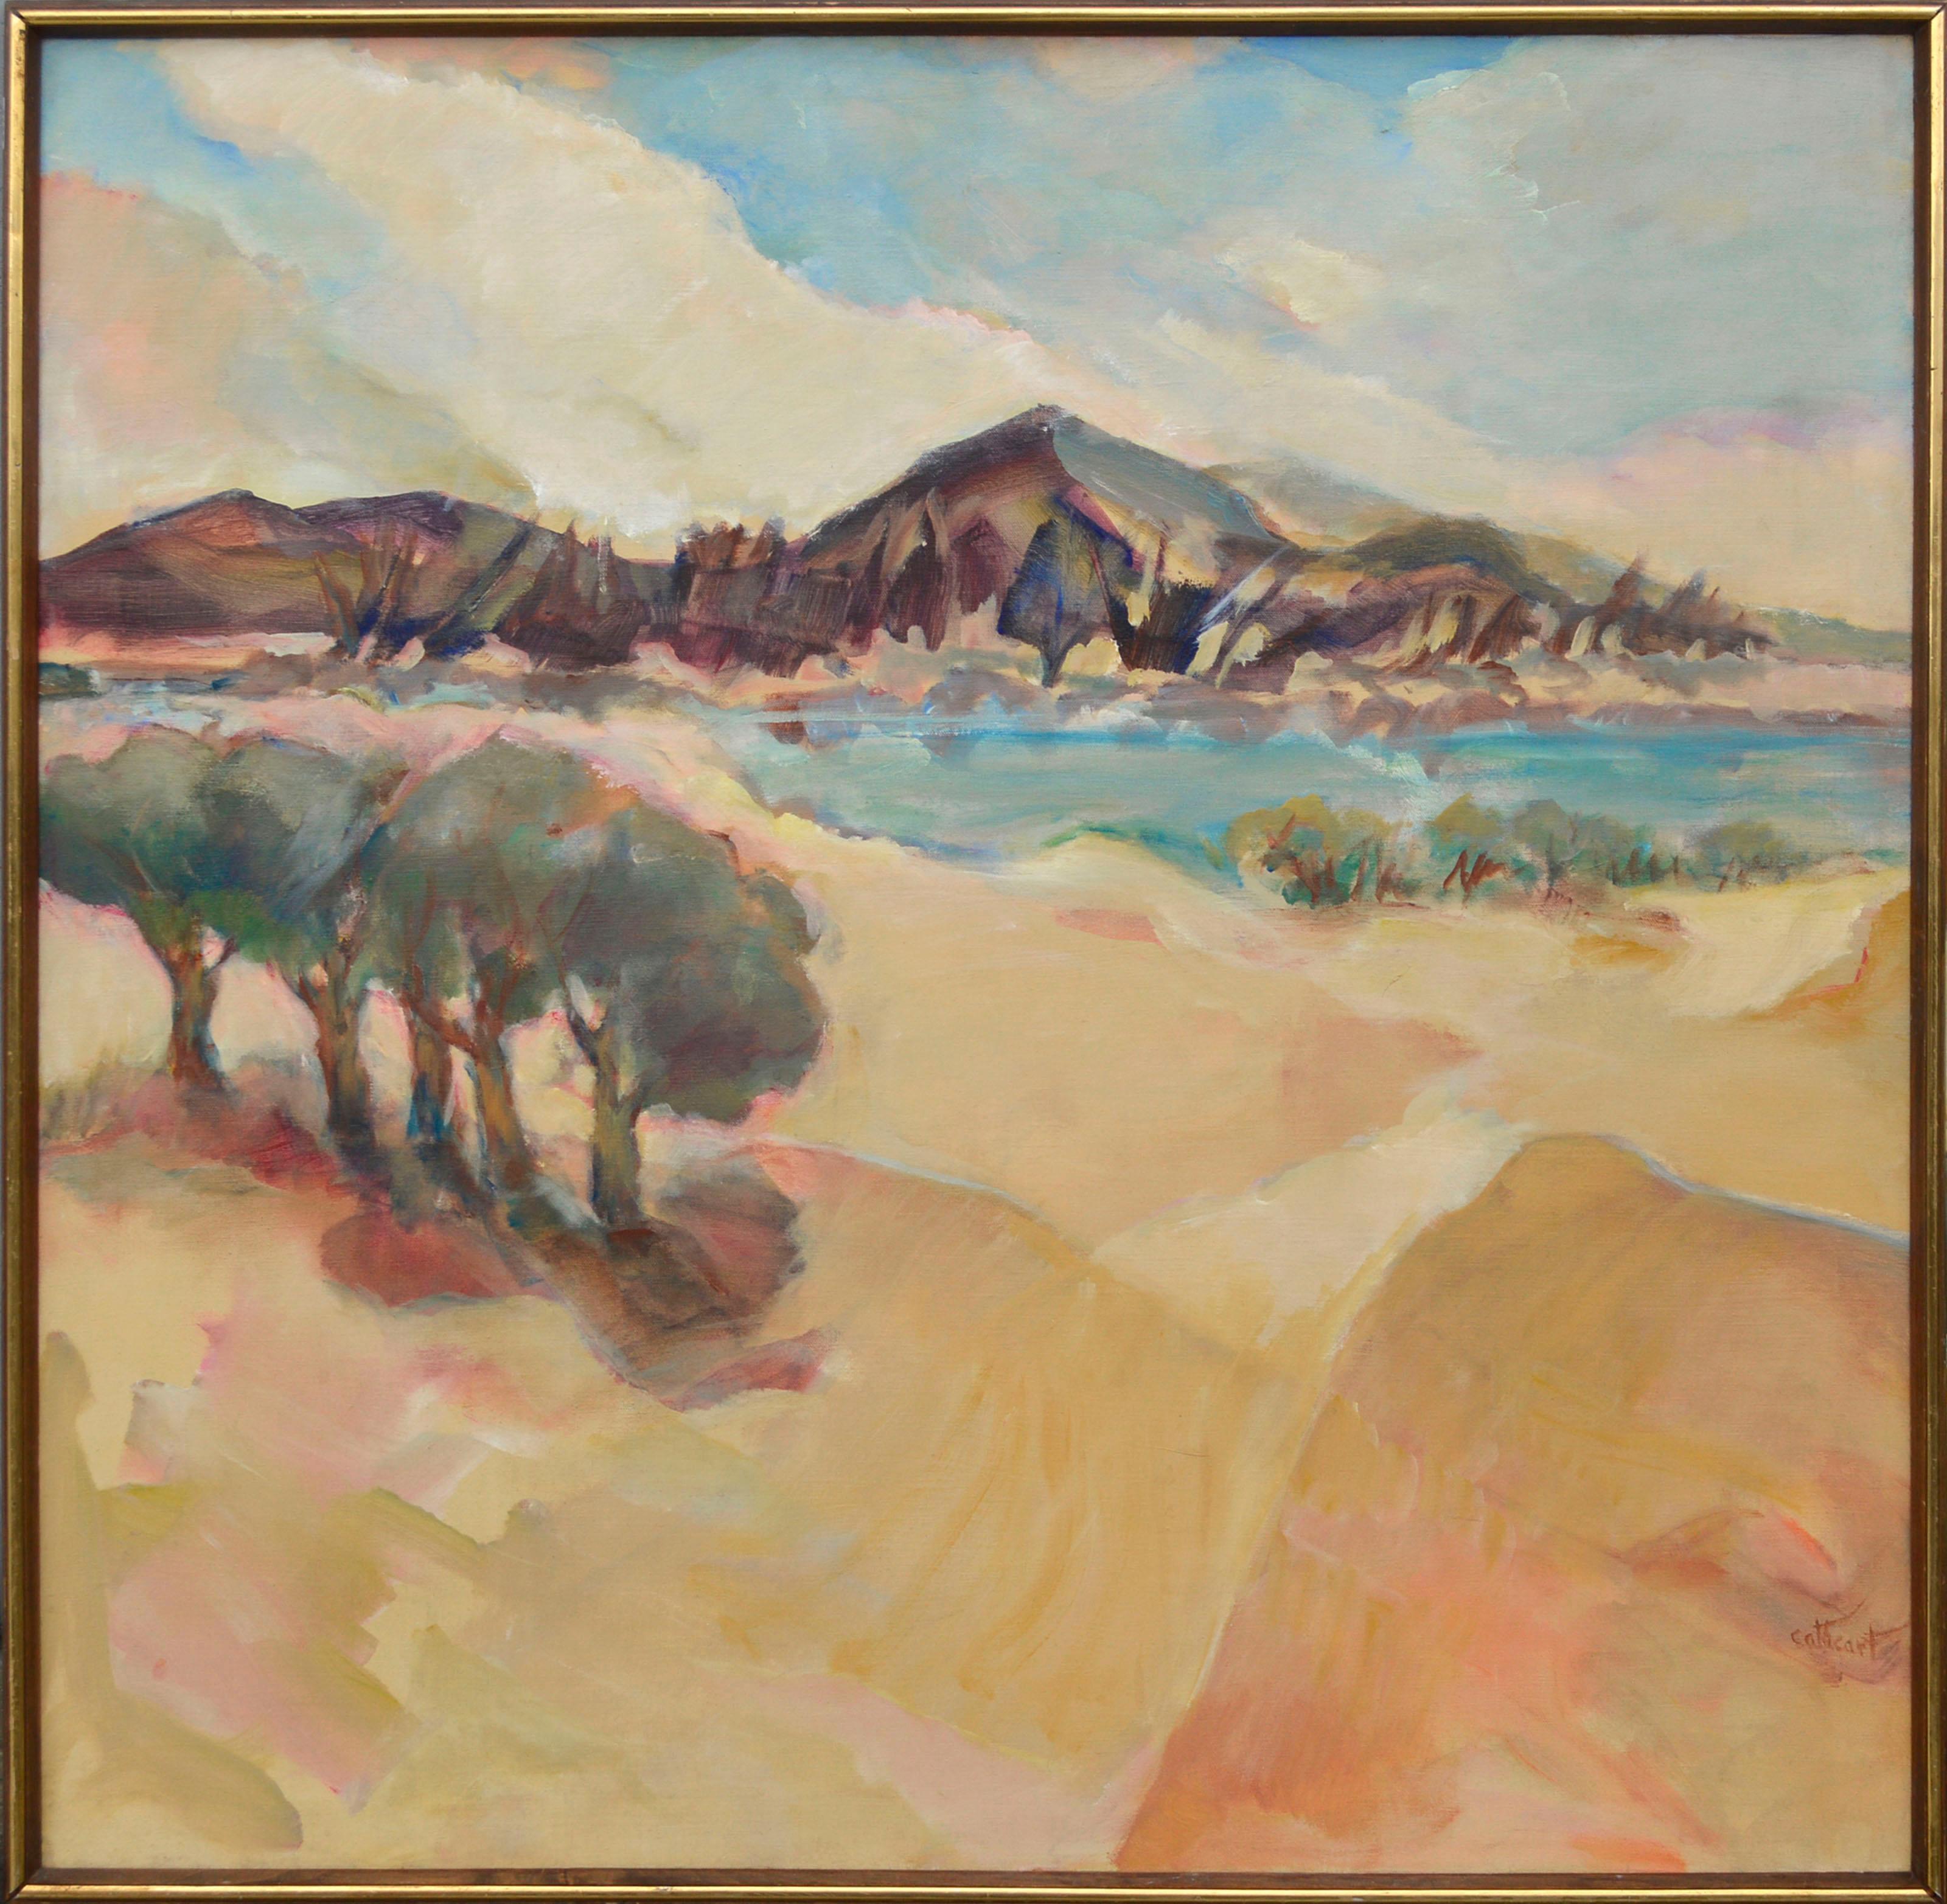 """Drifting Sands"" - Berkeley School Abstracted Landscape"